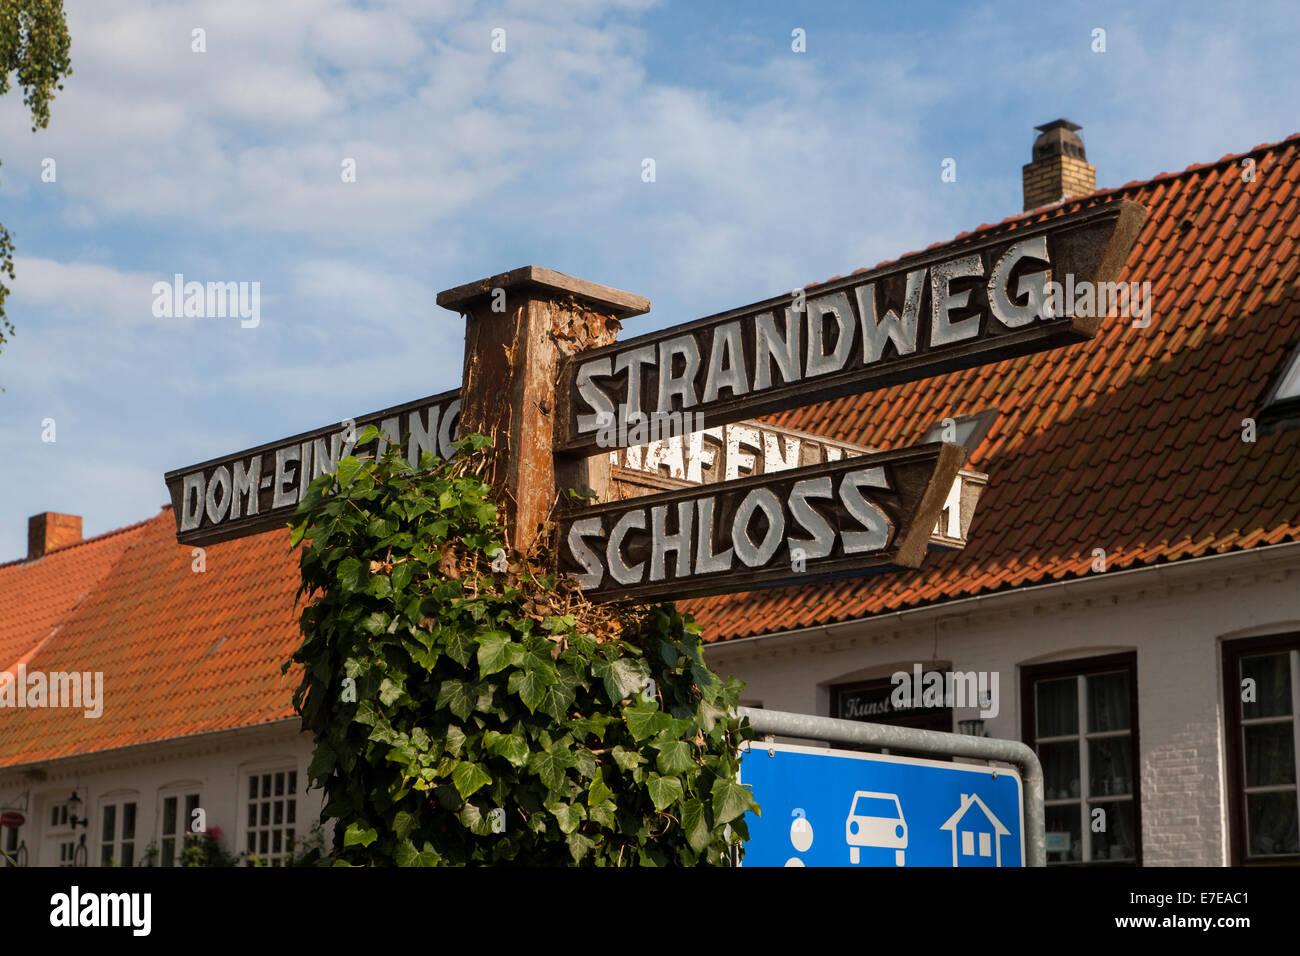 street signs in schleswig, schleswig-flensburg district, schleswig-holstein, germany - Stock Image